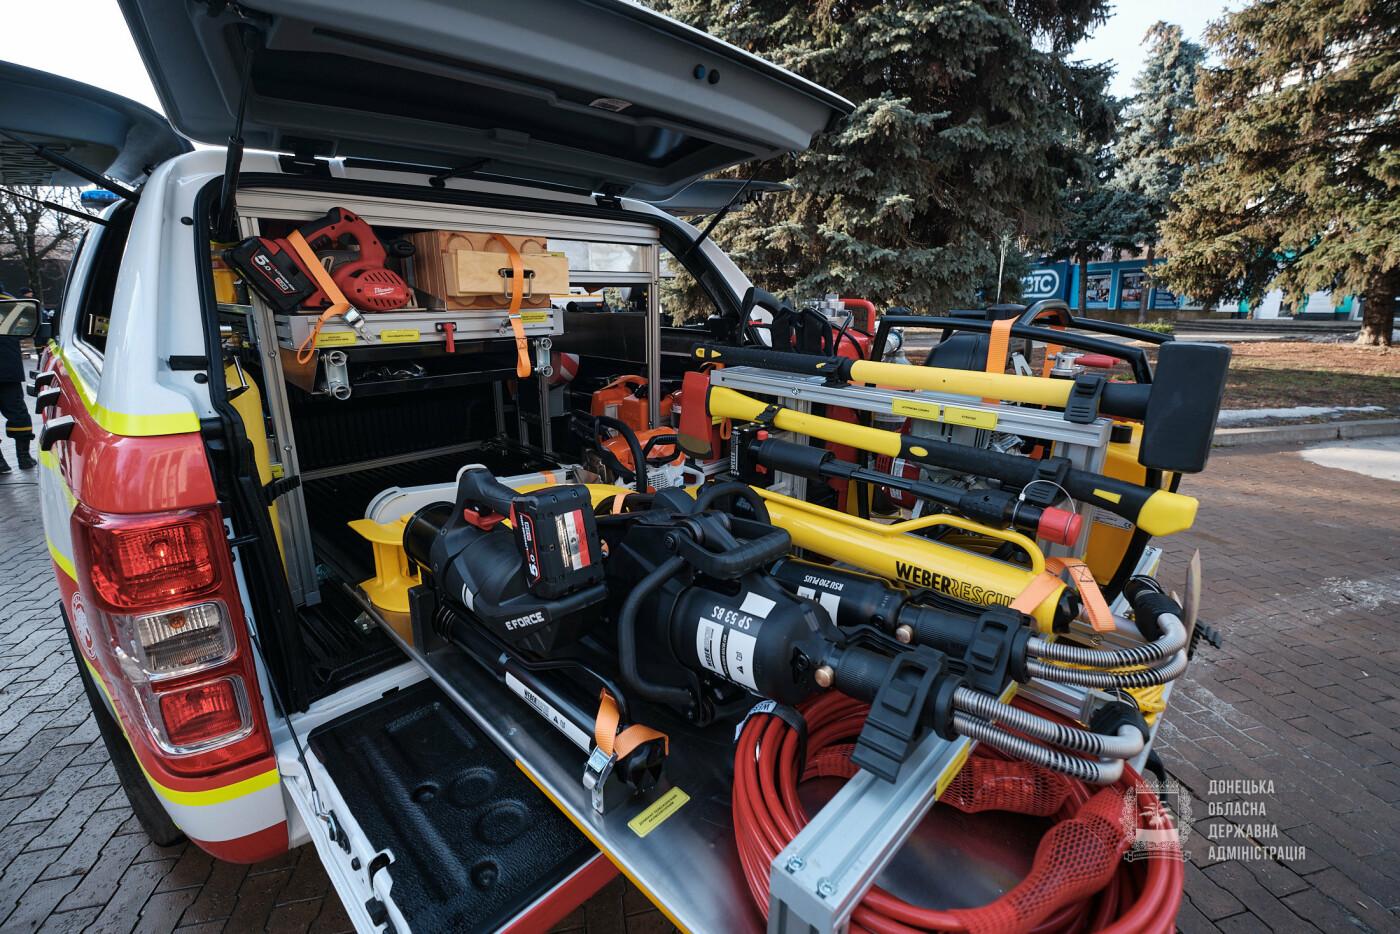 Слов'янські рятувальники отримали нову пожежну автоцистерну, фото-13